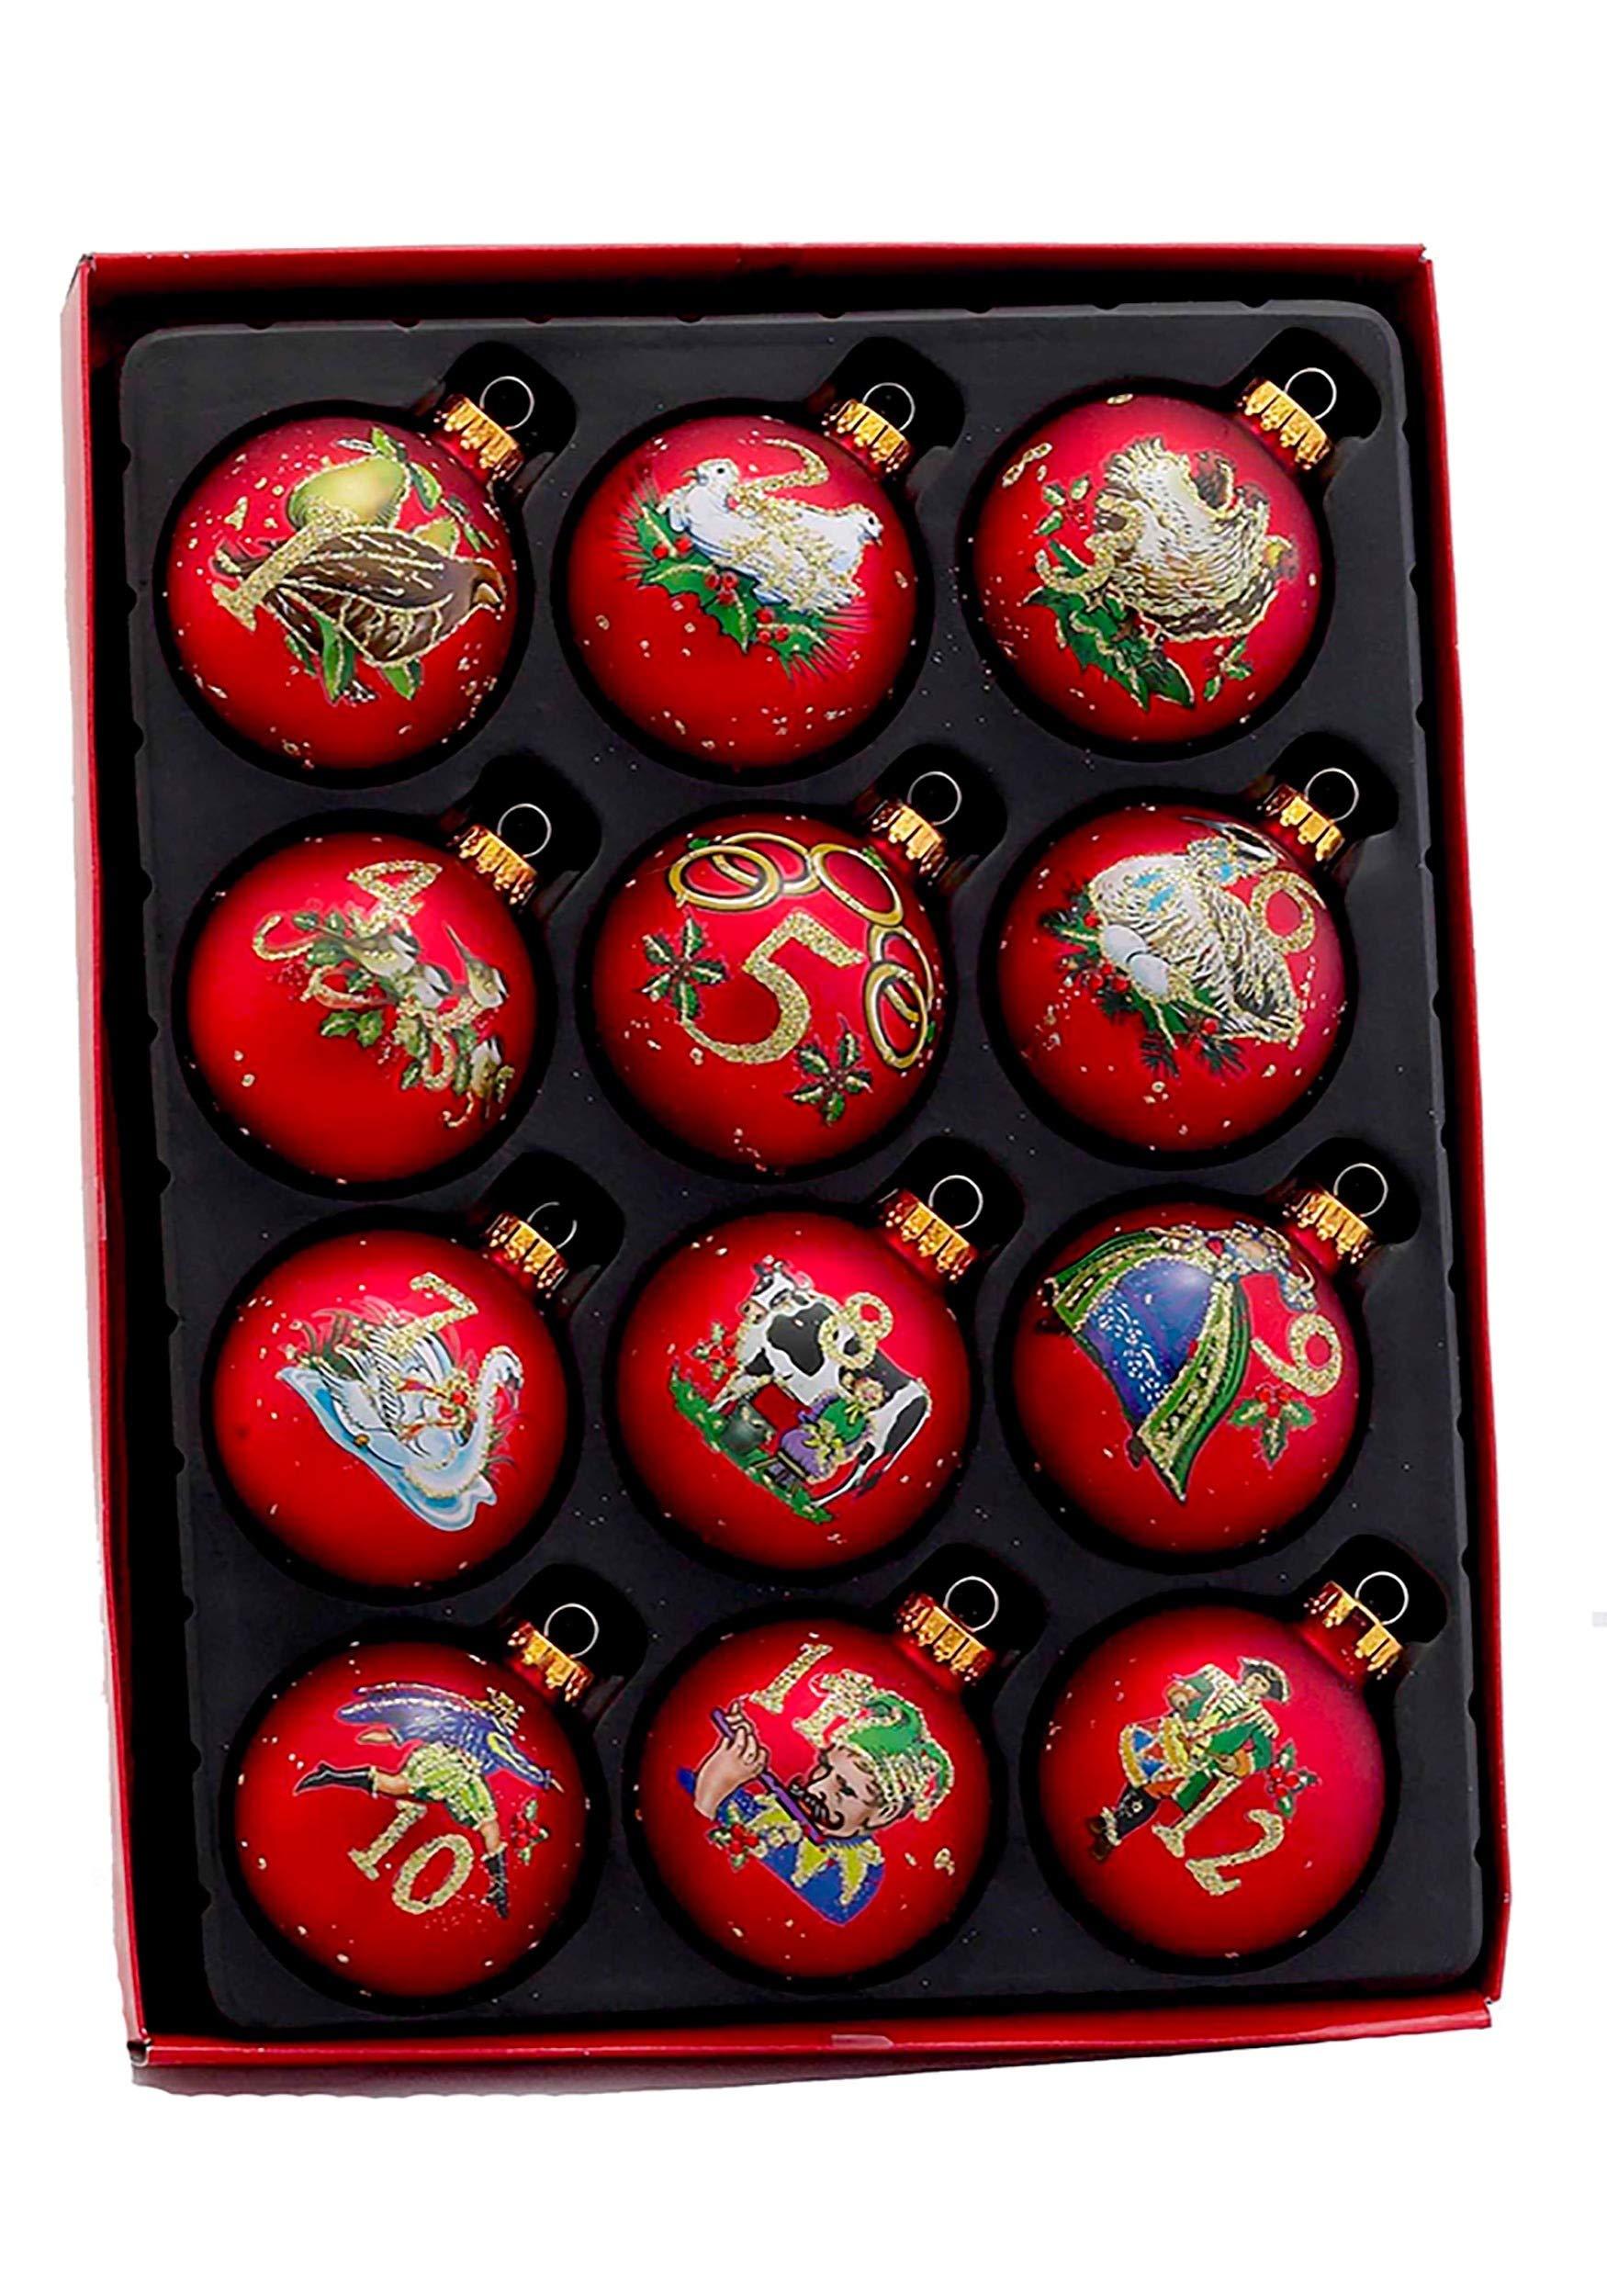 Kurt Adler Twelve Days of Christmas Glass Ball Ornament 12 Piece Set Standard